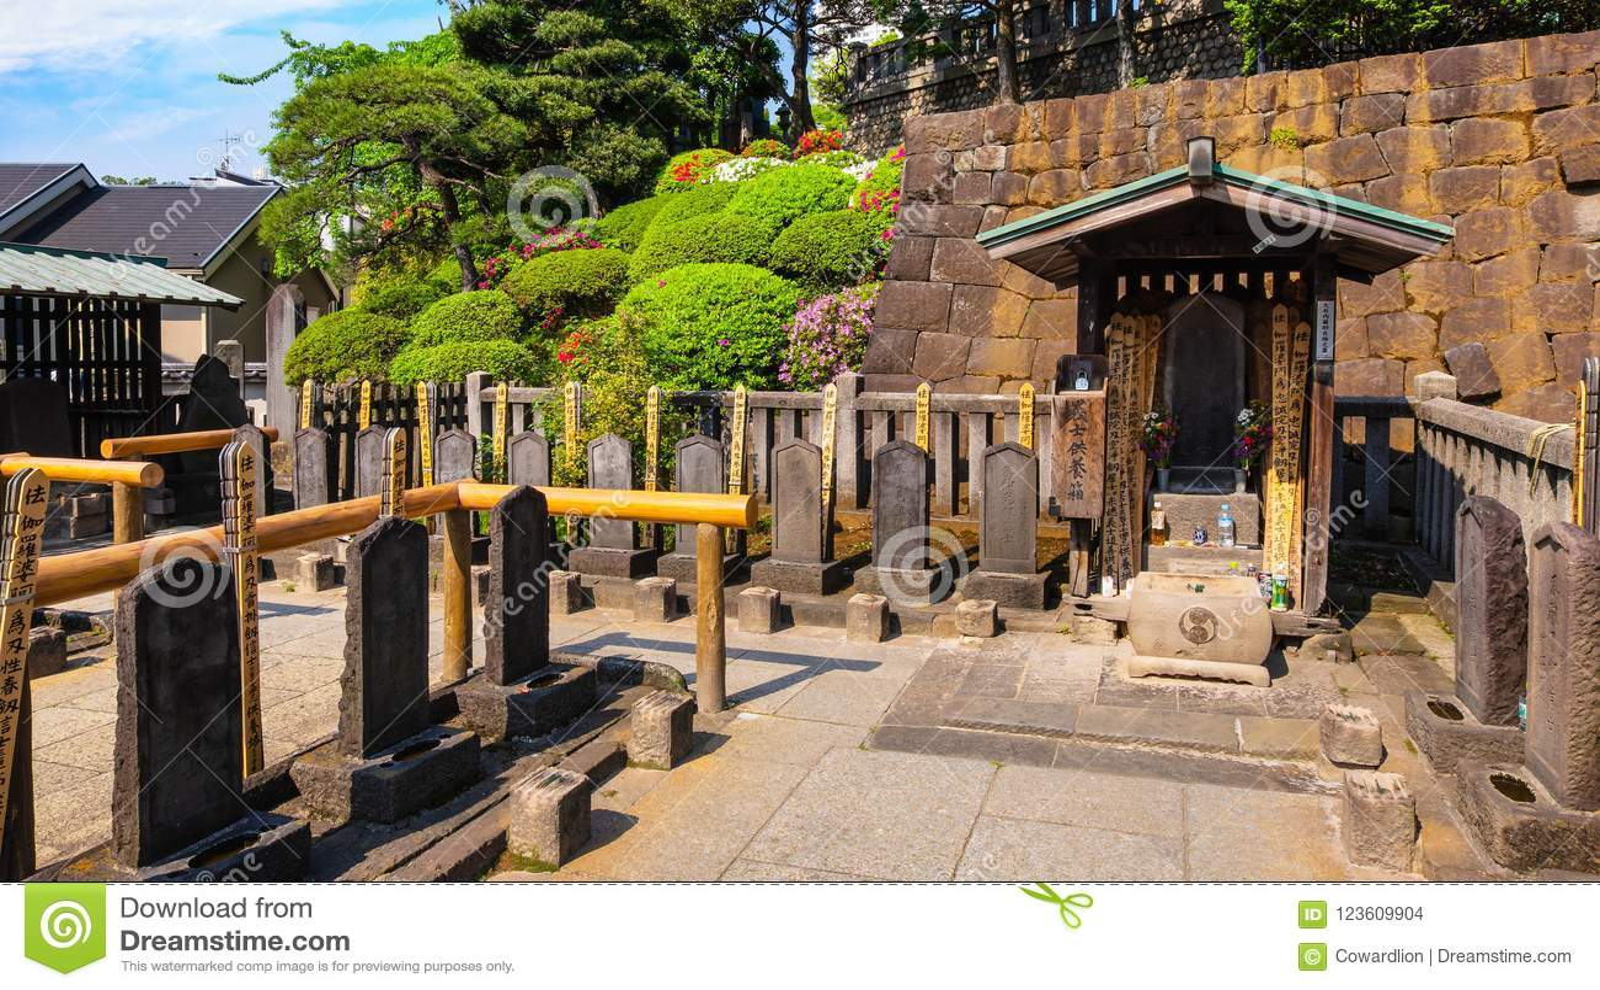 The Grave Of 47 Ronin At Sengakuji Temple In Tokyo, Japan Stock